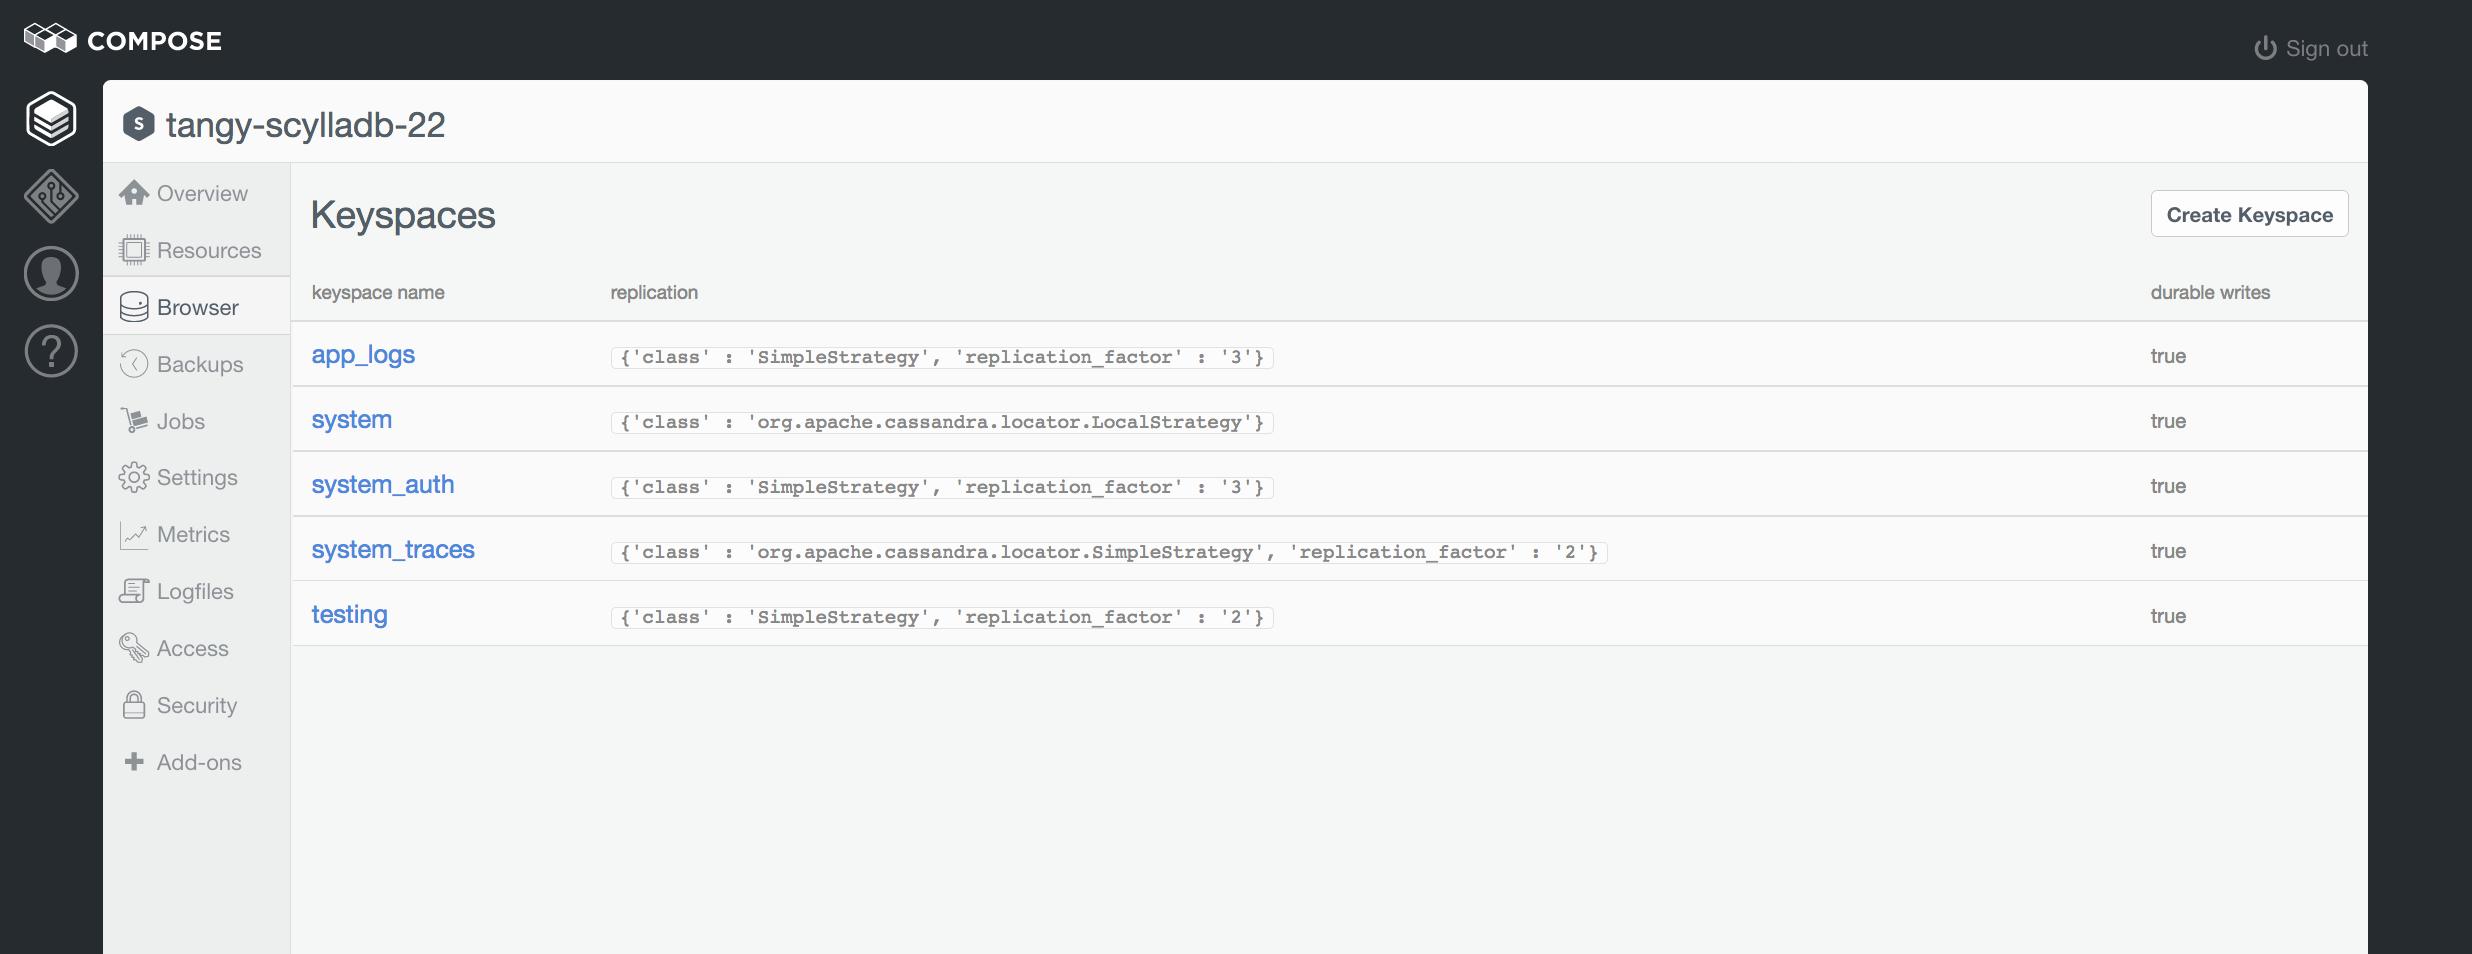 Keyspaces list in the browser.